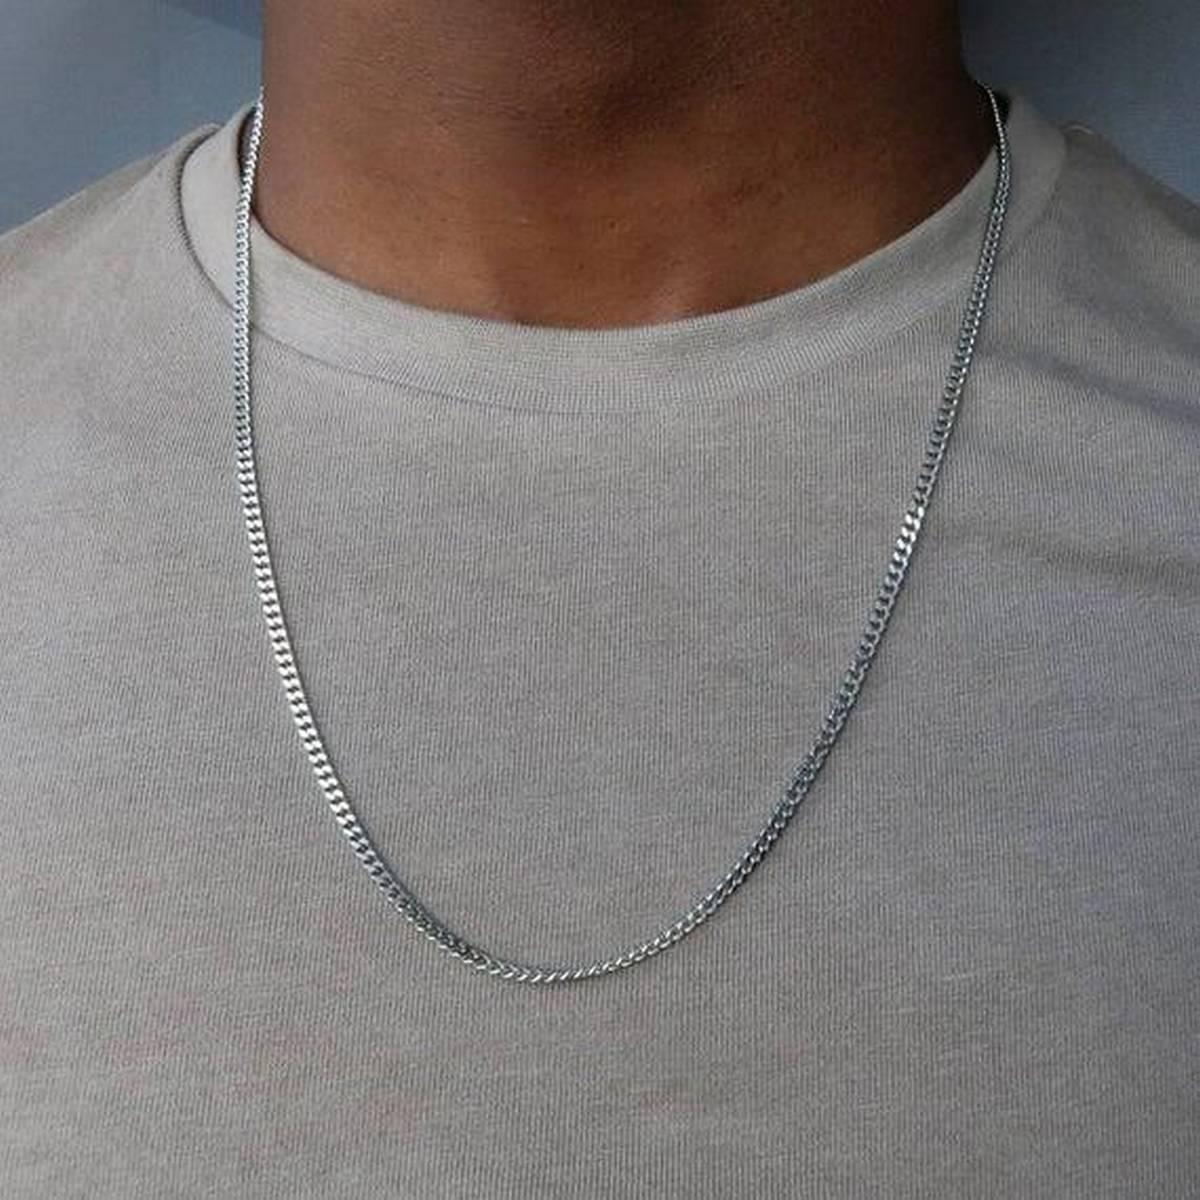 THIN SILVER TRENDY neck chain THIN SILVER AMERICAN TRENDY neck chain